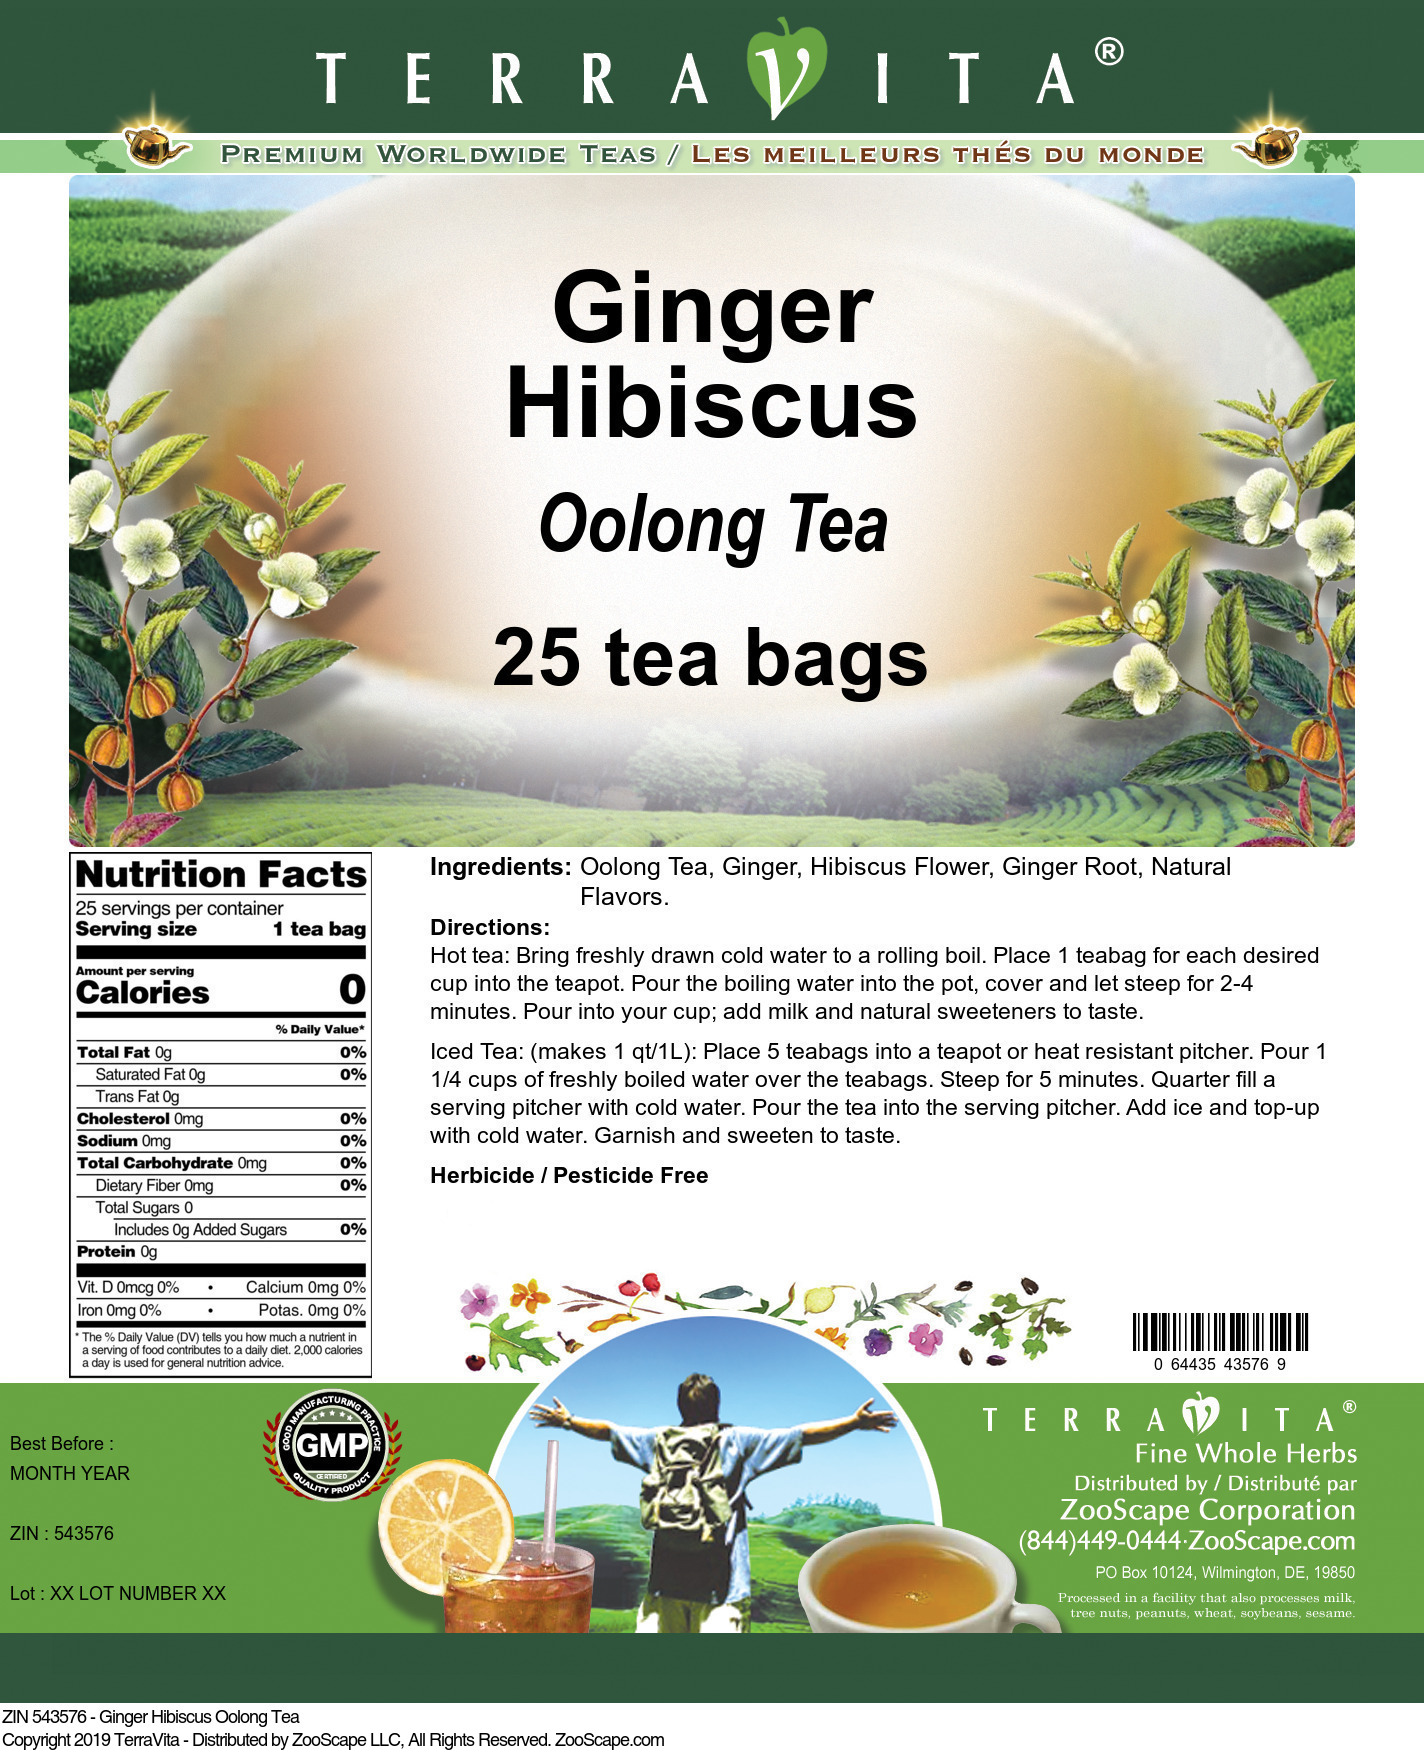 Ginger Hibiscus Oolong Tea